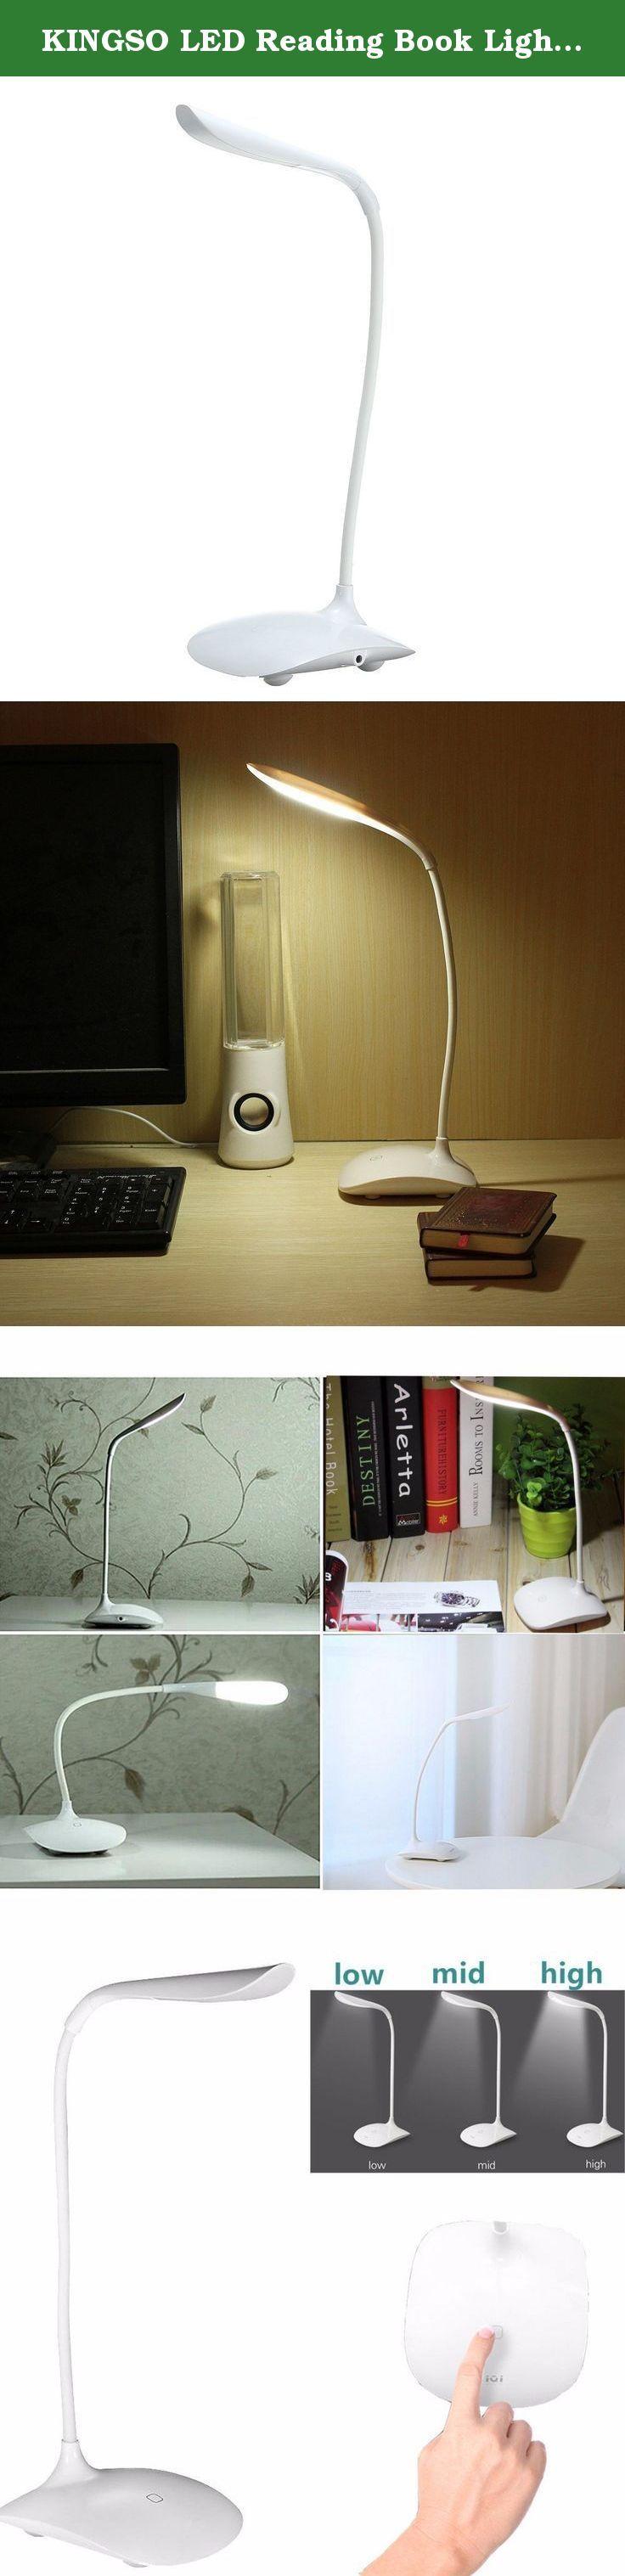 kingso led reading book light rechargeable usb touch sensor